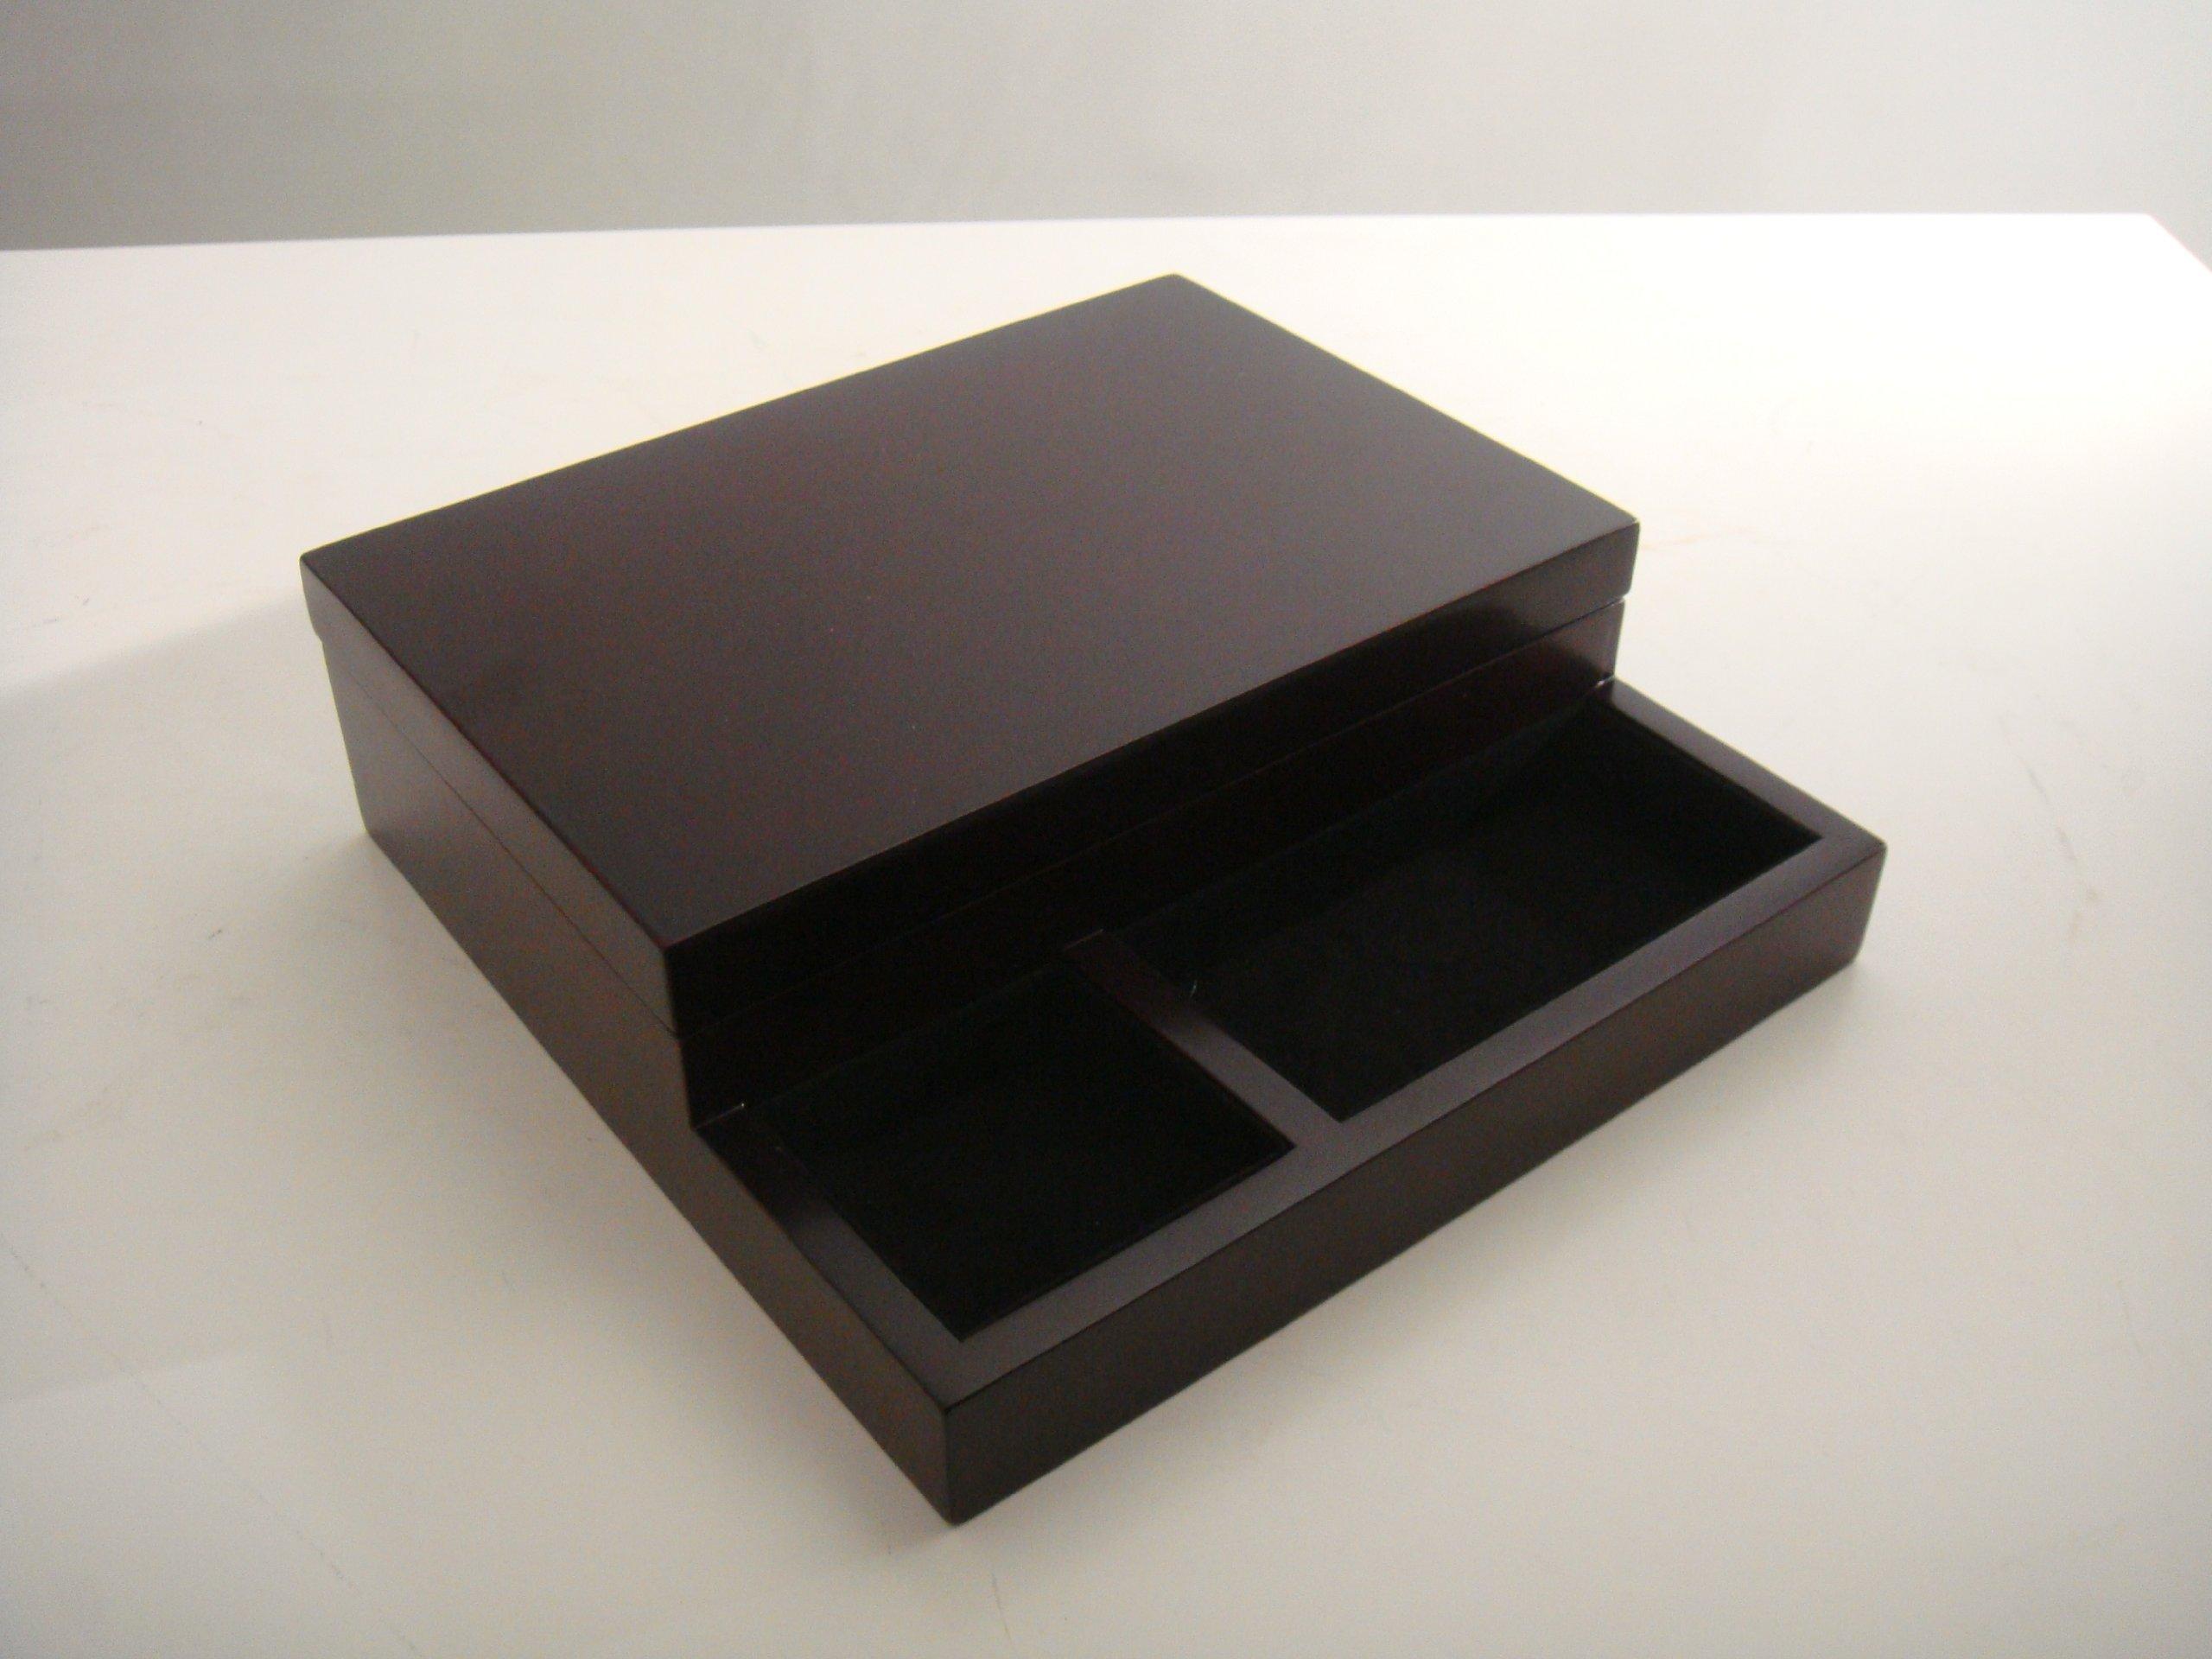 Proman Products DV16652 Dresser Valet